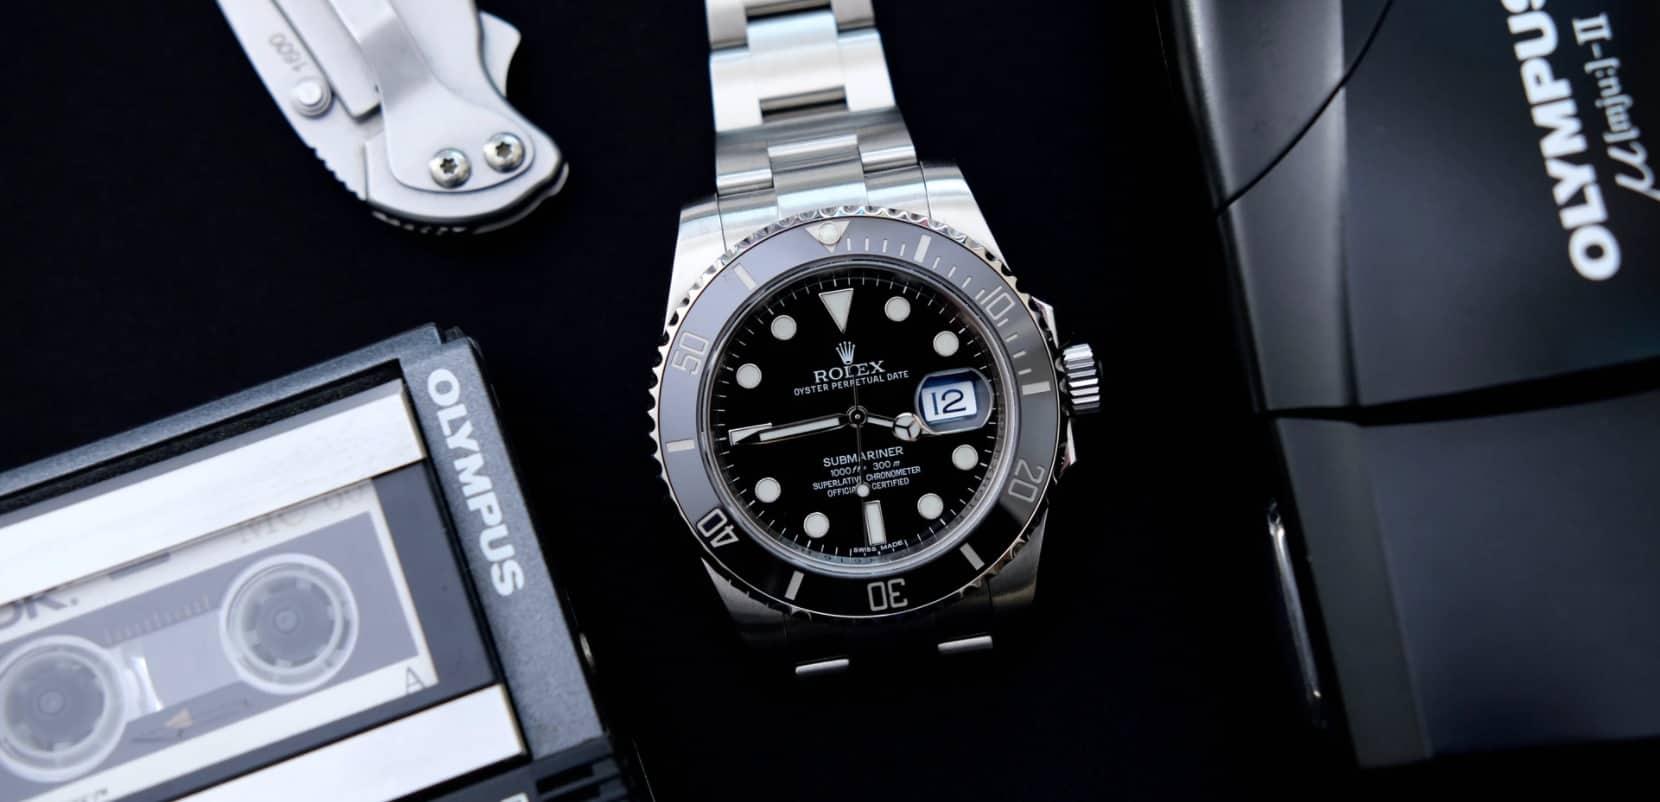 Next Best Watch After Rolex